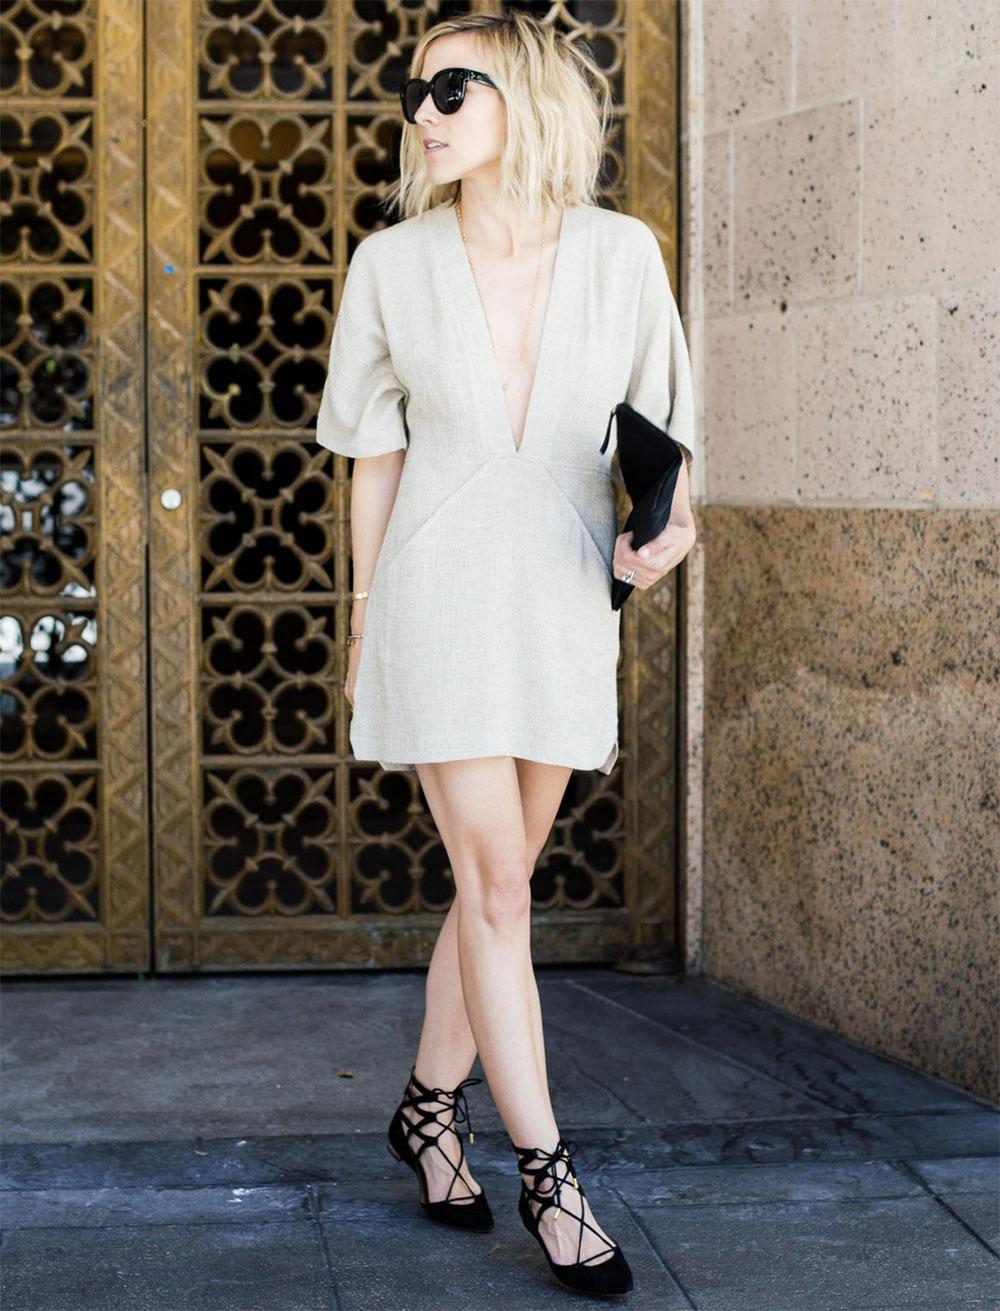 v neck dress outfit